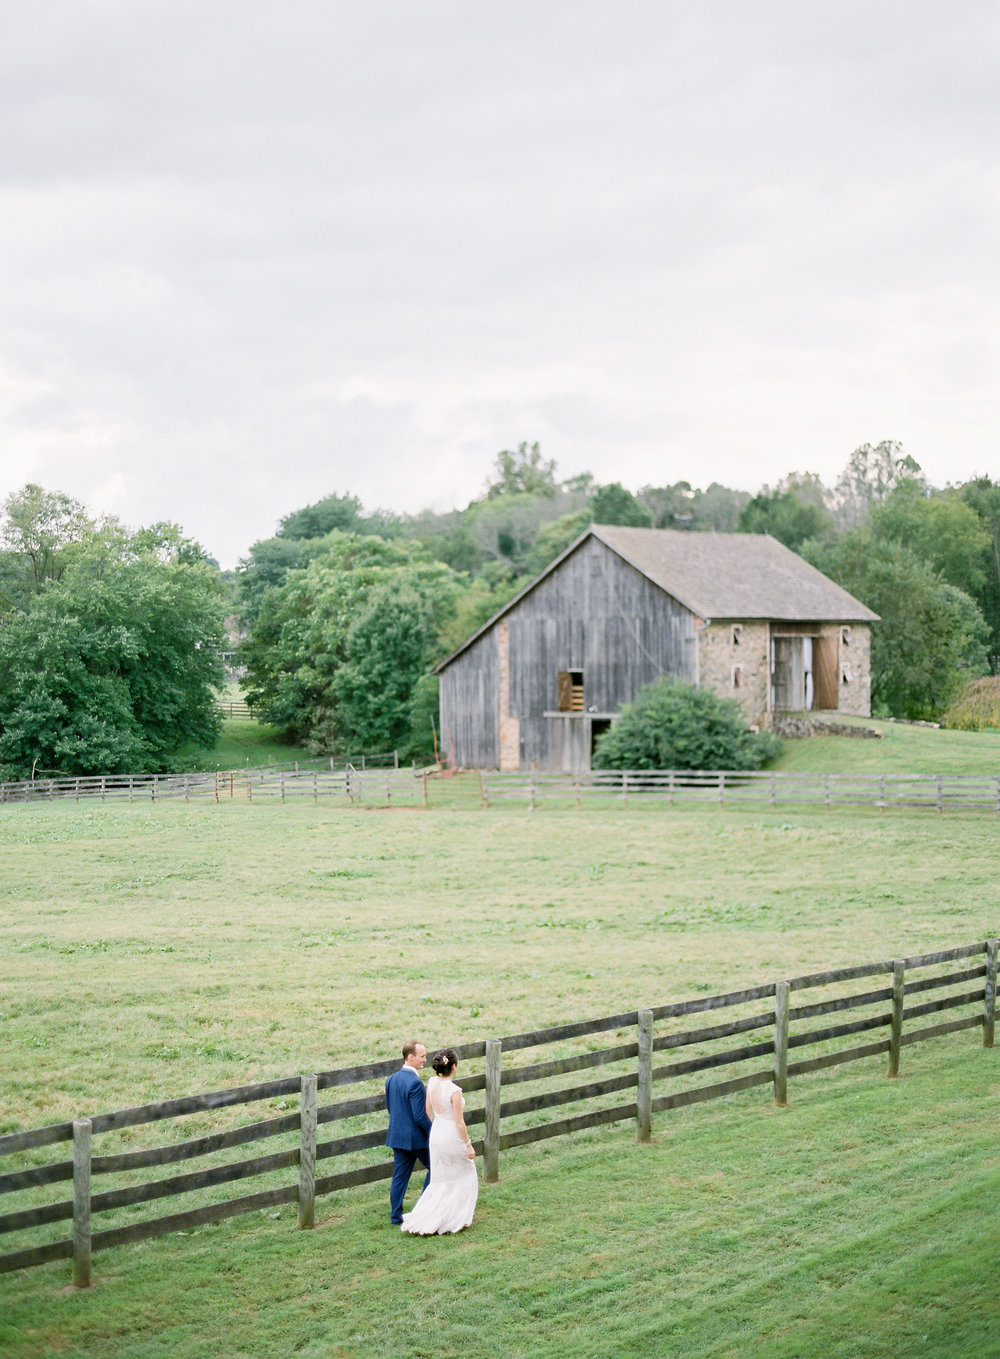 Vicki_Grafton_Photography_wedding-621.jpg